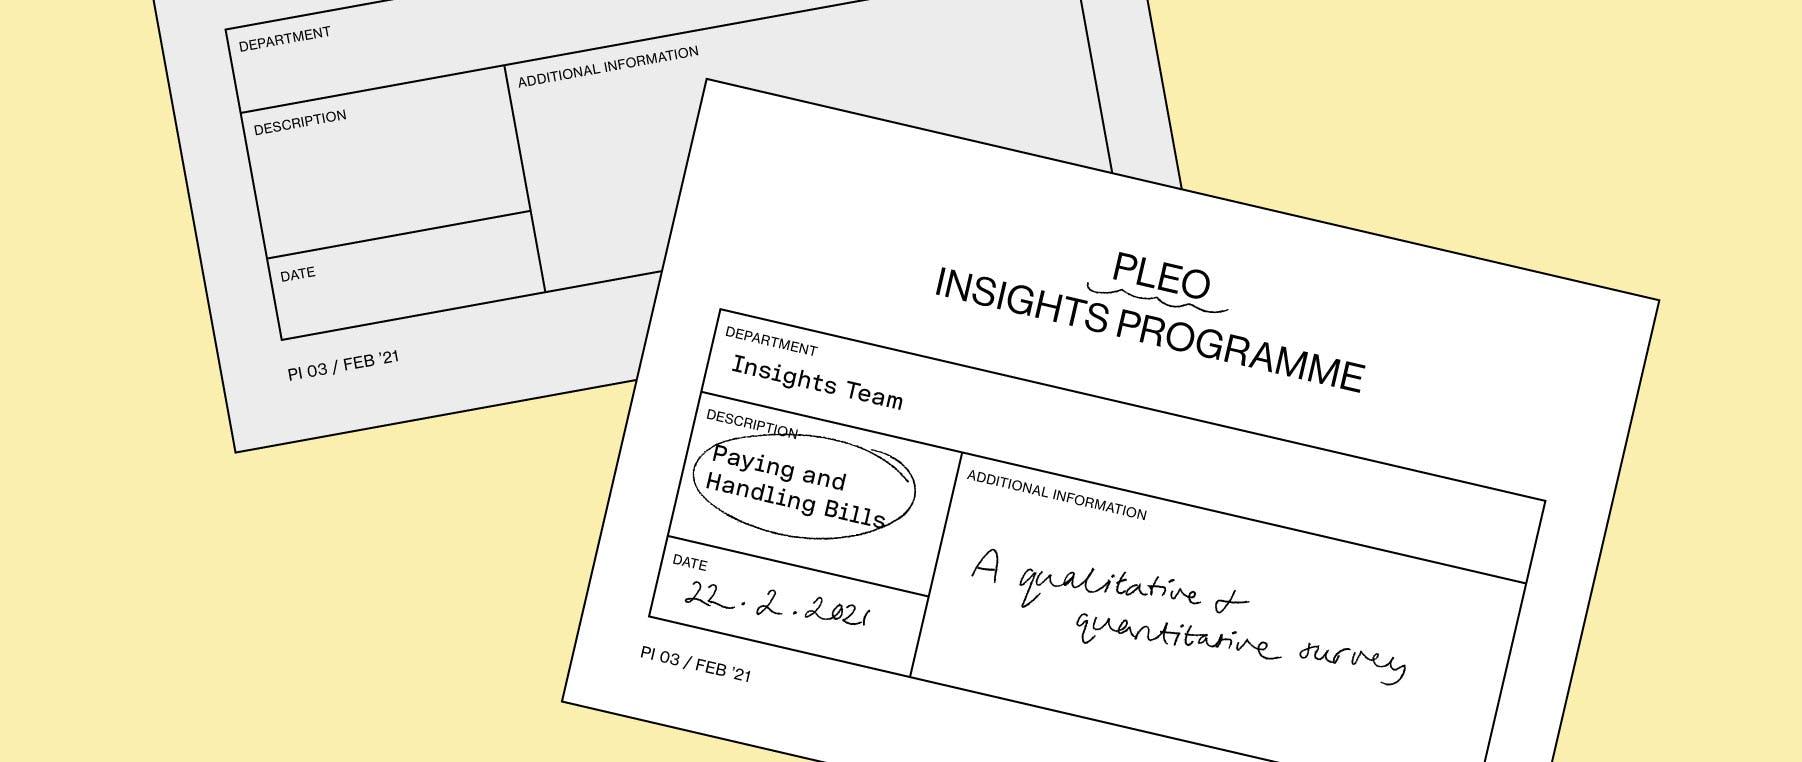 Pleo's invoice management report